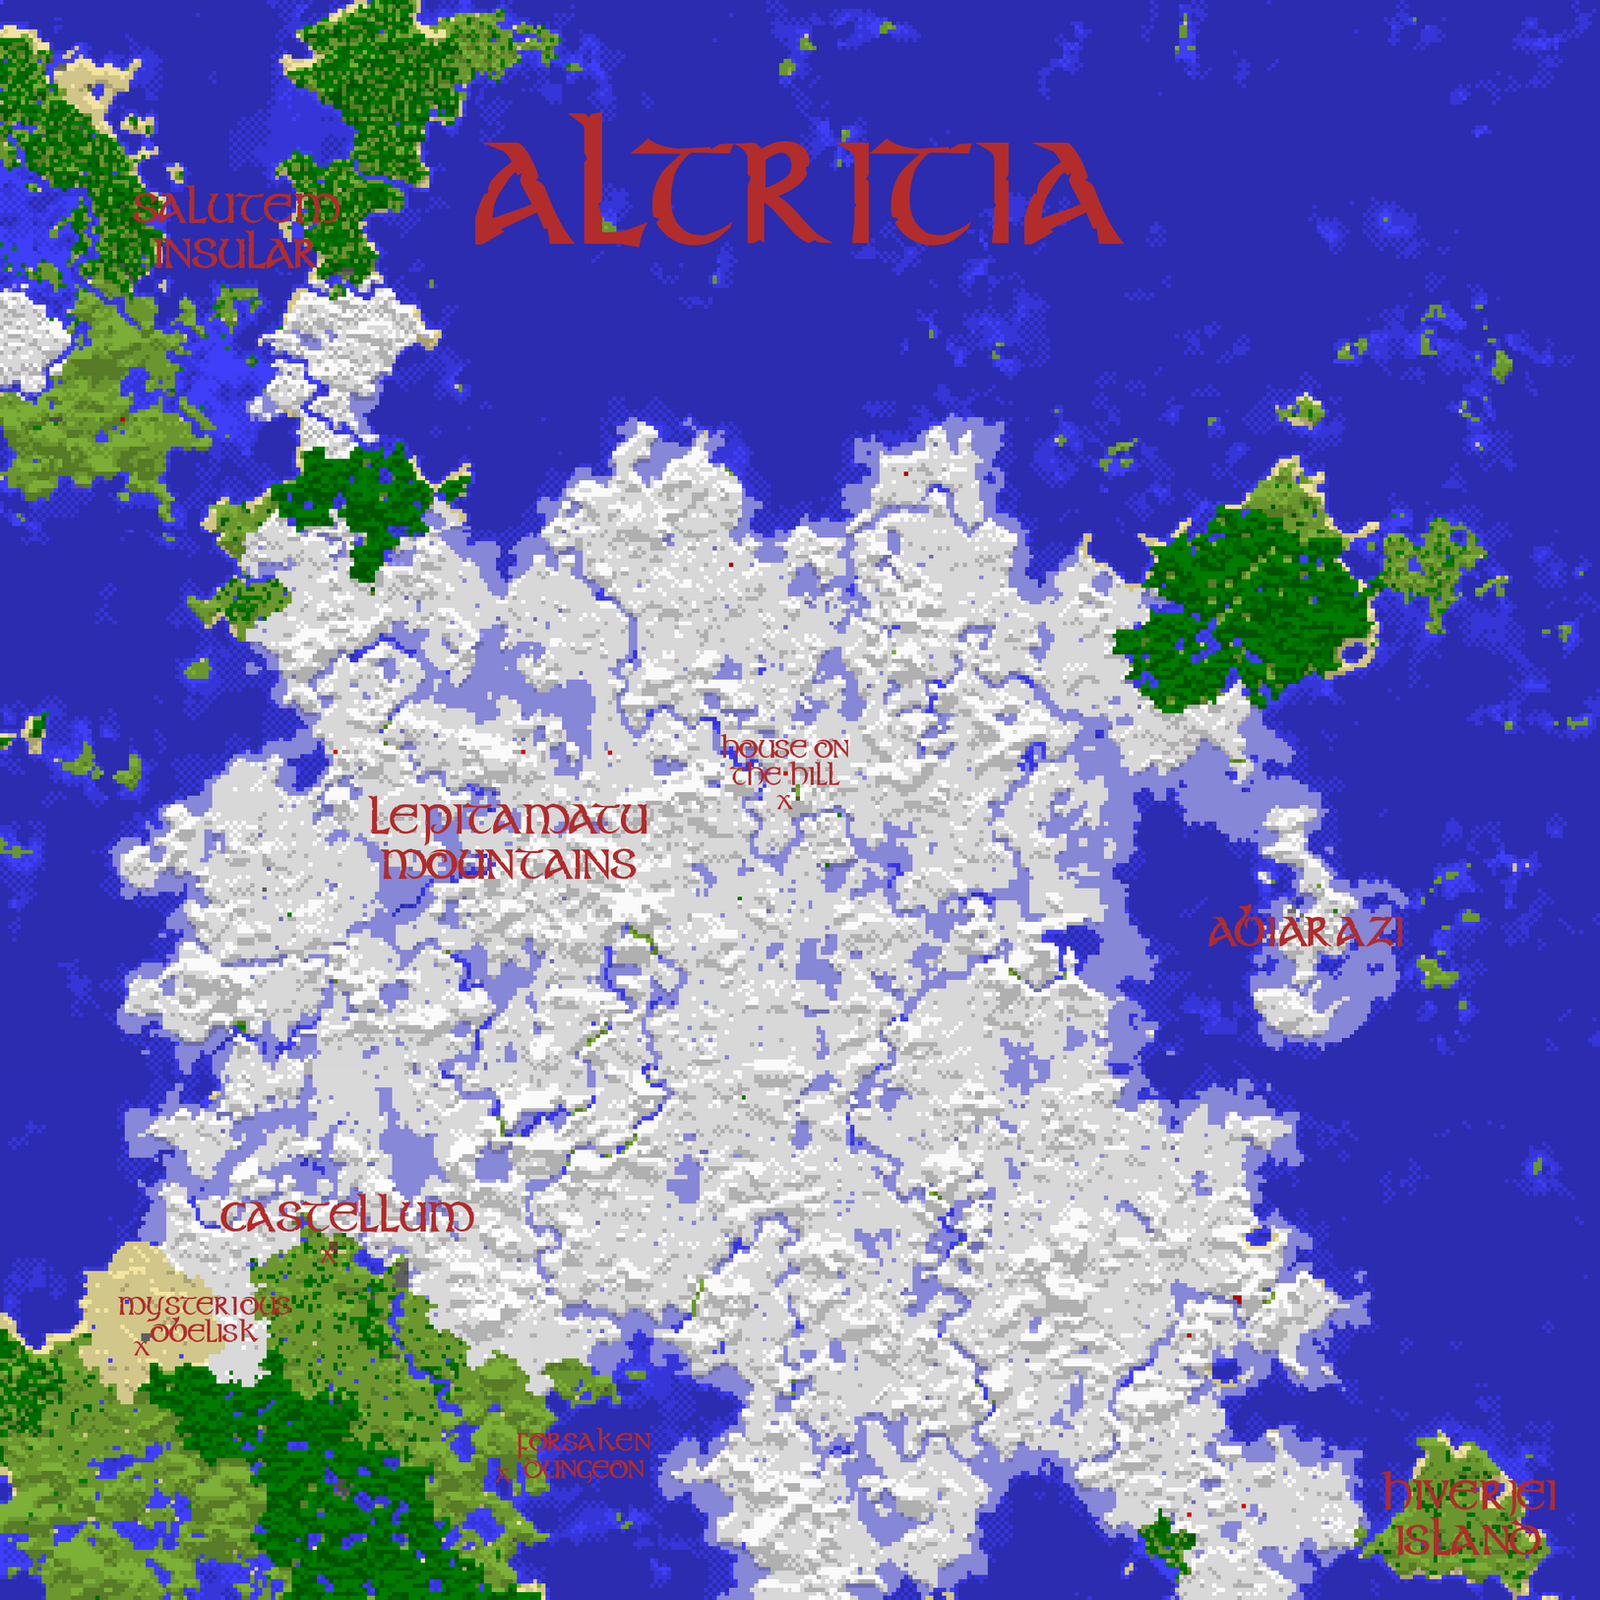 Map of altritia minecraft multiplayer world map by thesharp0ne on map of altritia minecraft multiplayer world map by thesharp0ne gumiabroncs Gallery